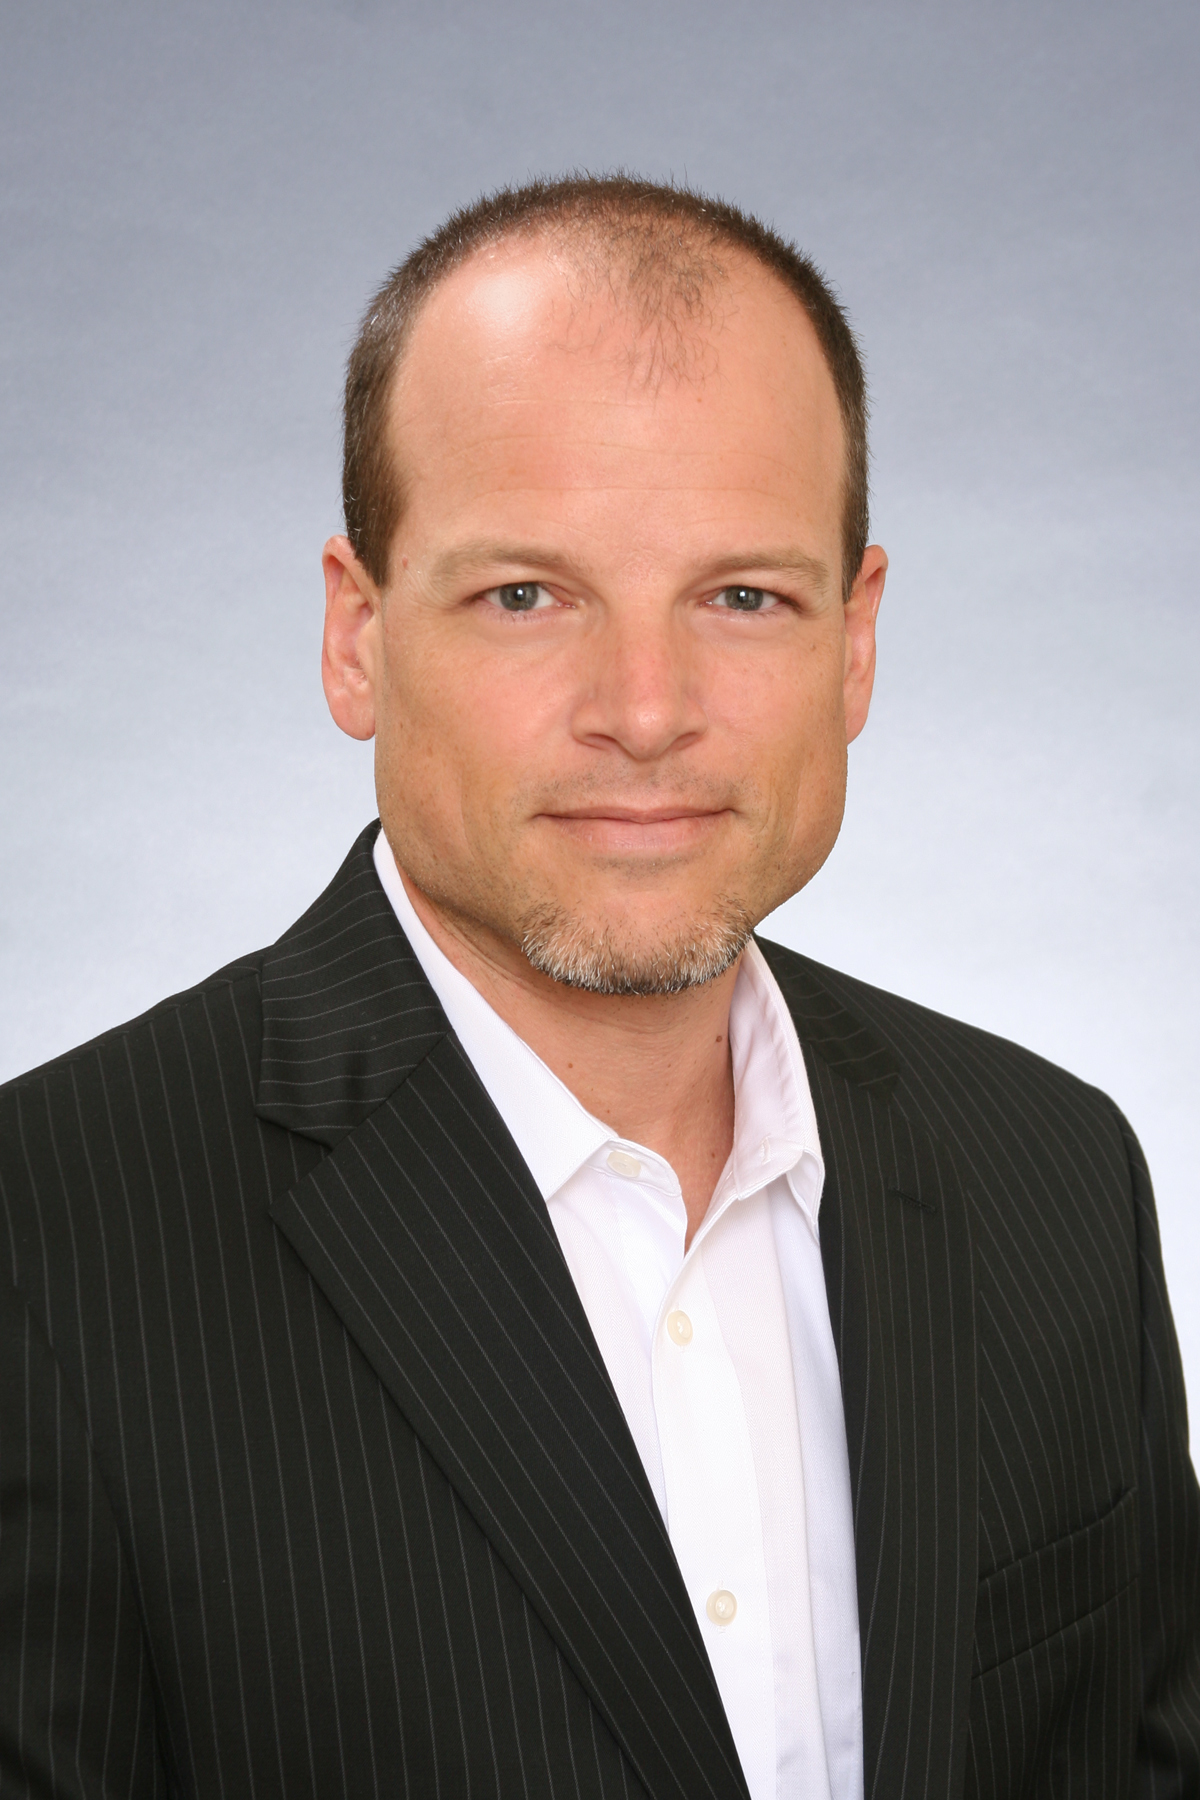 Keith Veres, financial advisor Fort Myers FL